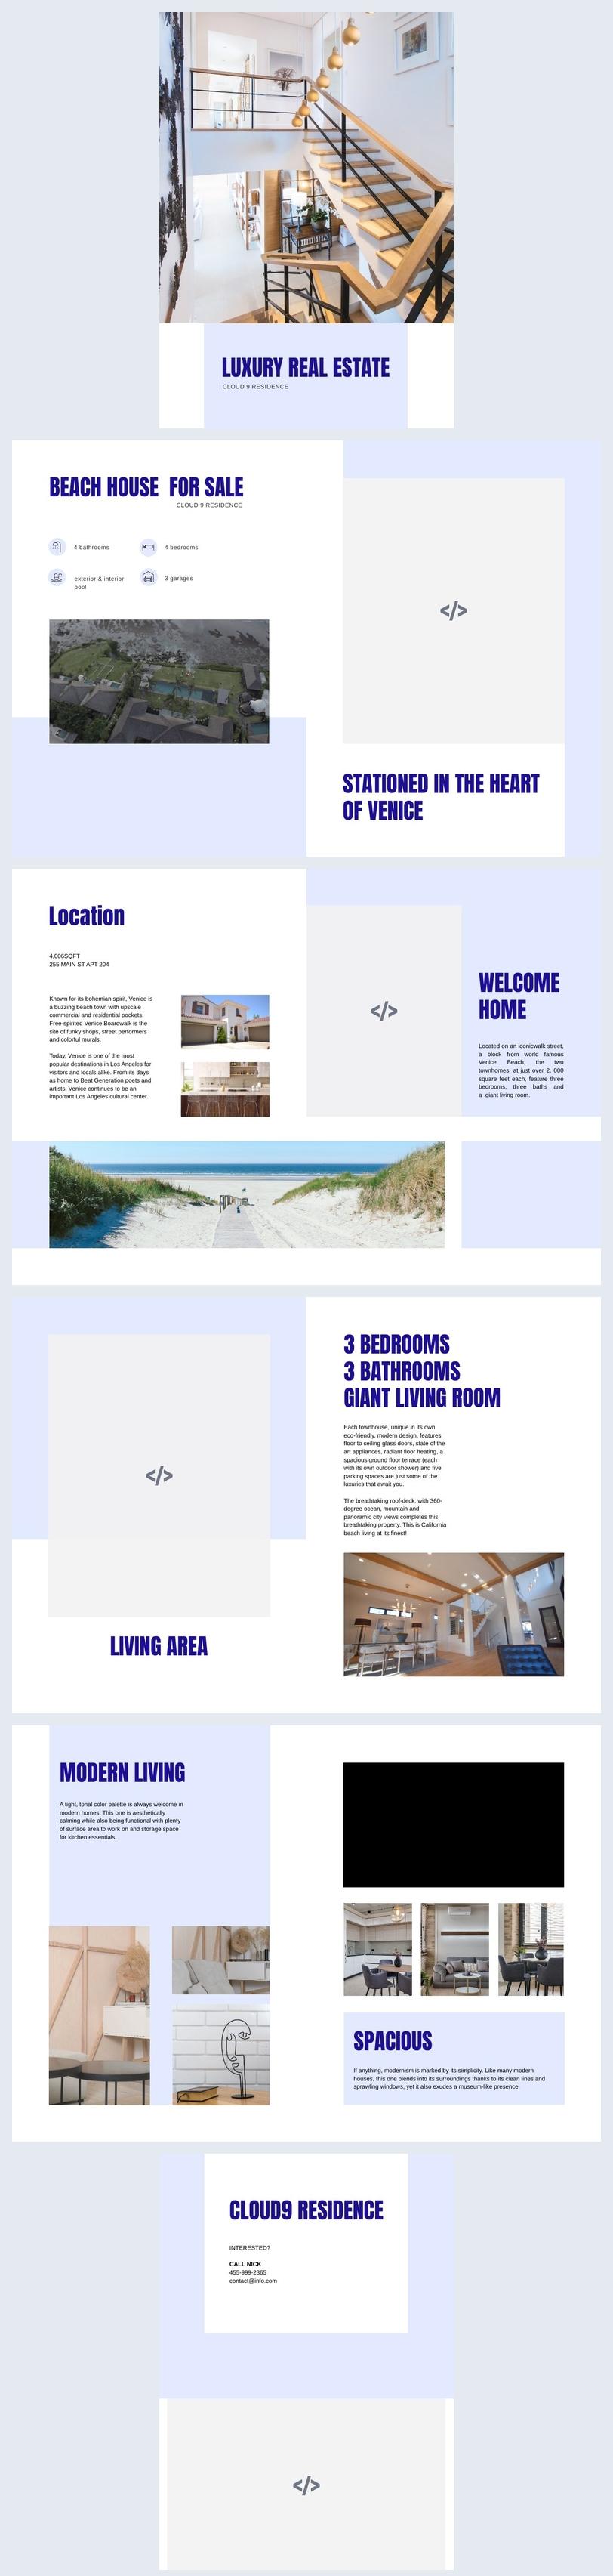 Luxury Real Estate Brochure Design Example